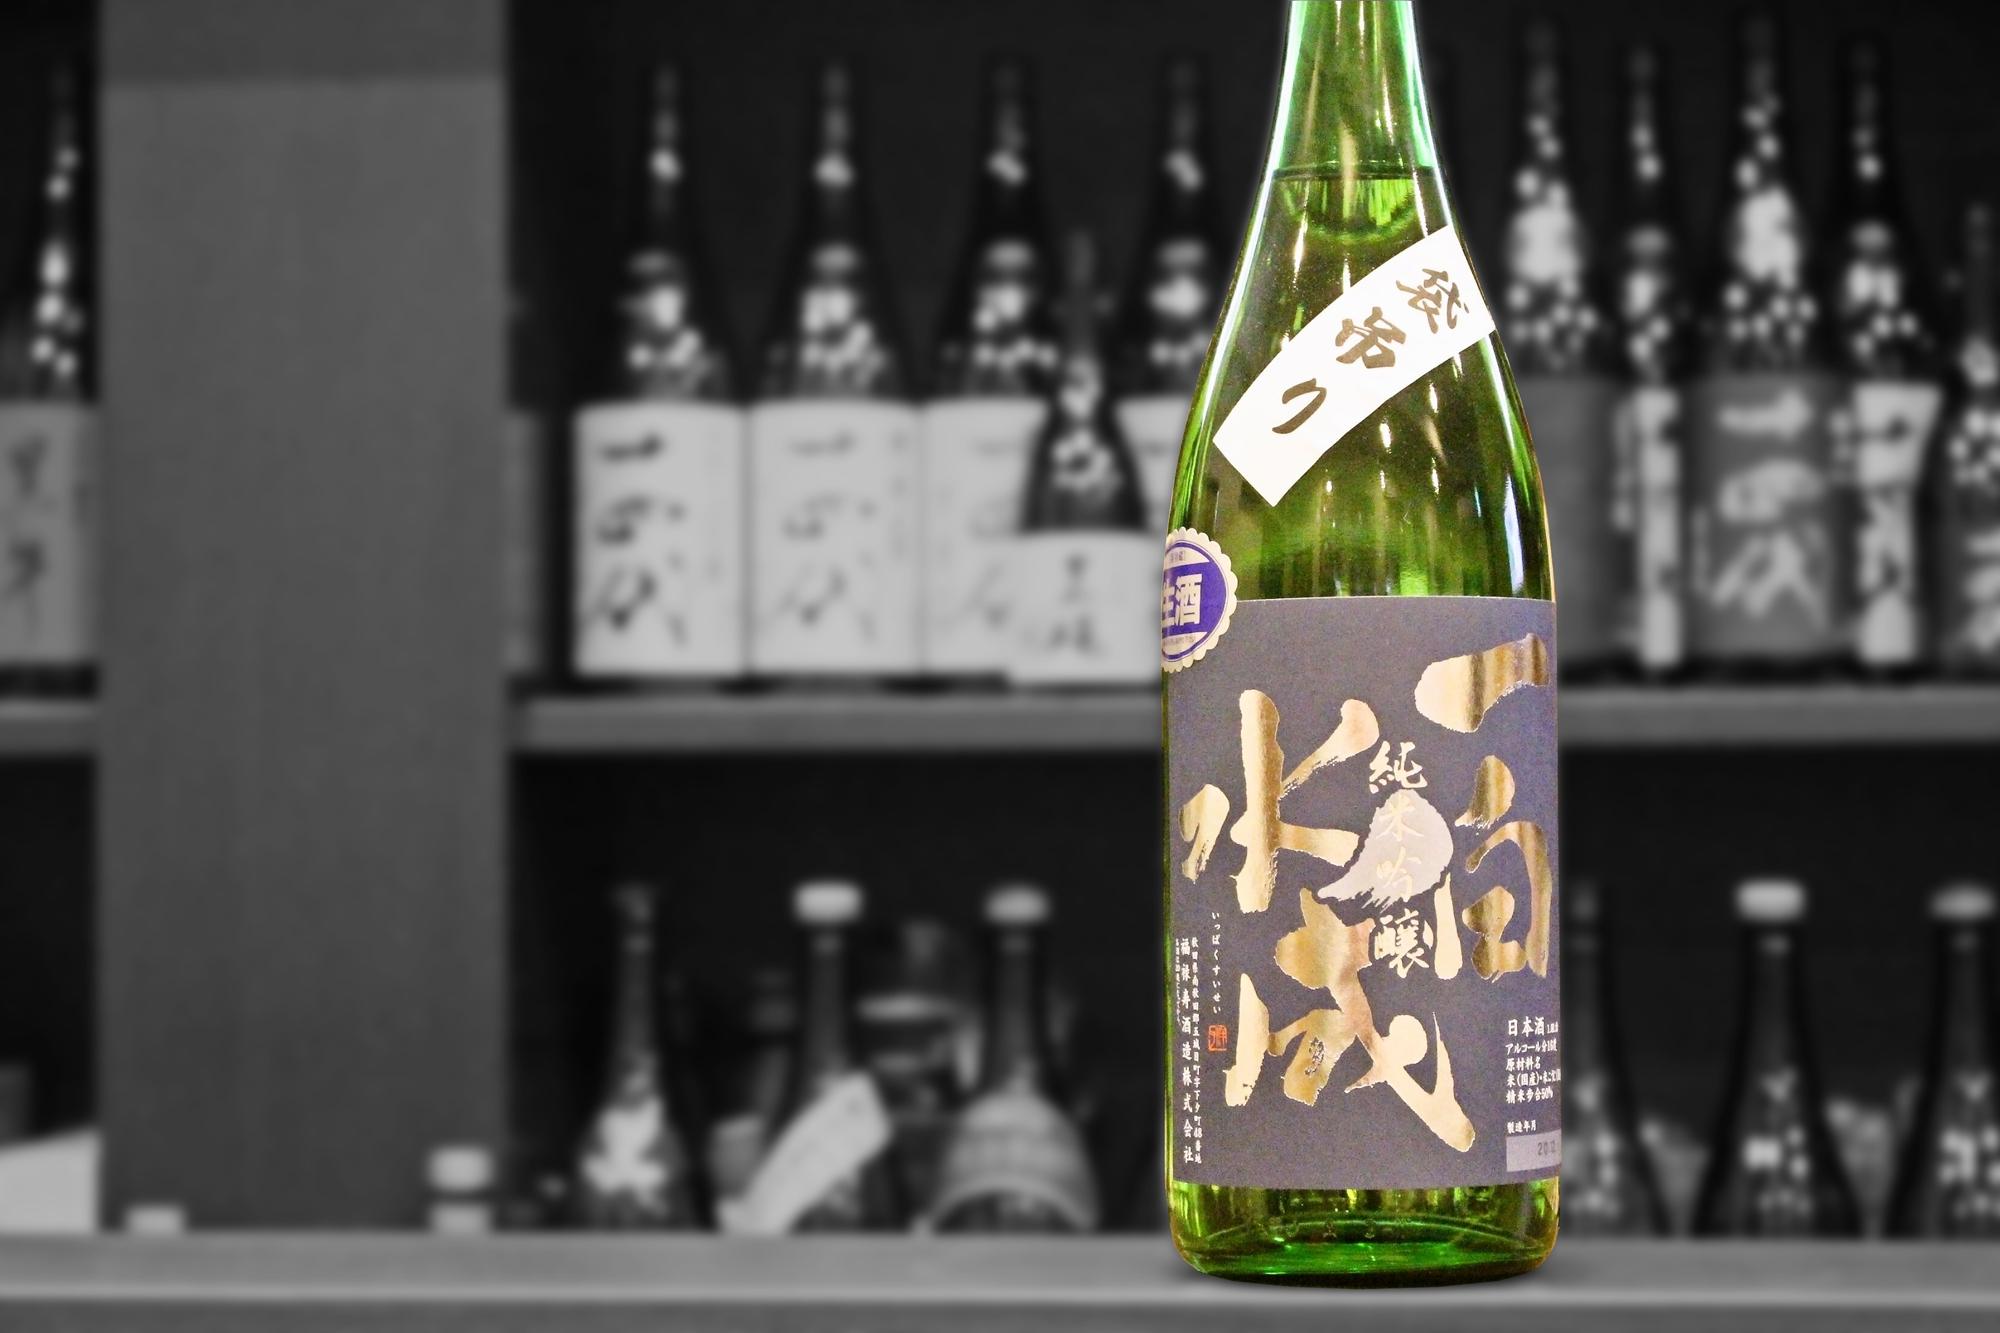 一白水成袋吊り純米吟醸生酒202102-001